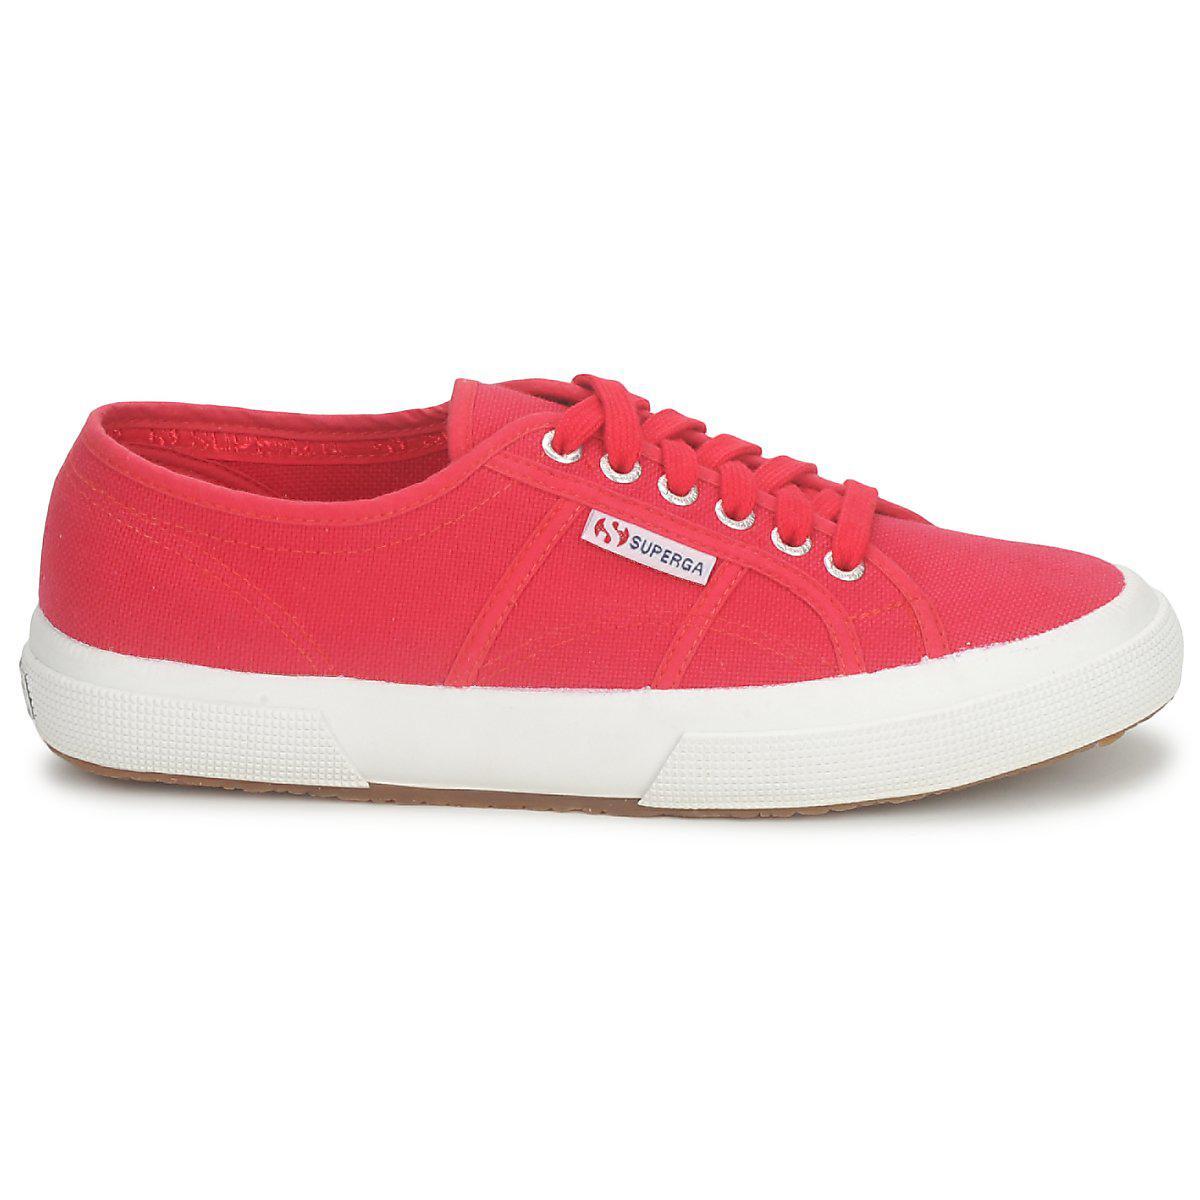 e5c8f080ebadb Superga - 2750 Cotu Classic Men's Shoes (trainers) In Red for Men - Lyst.  View fullscreen